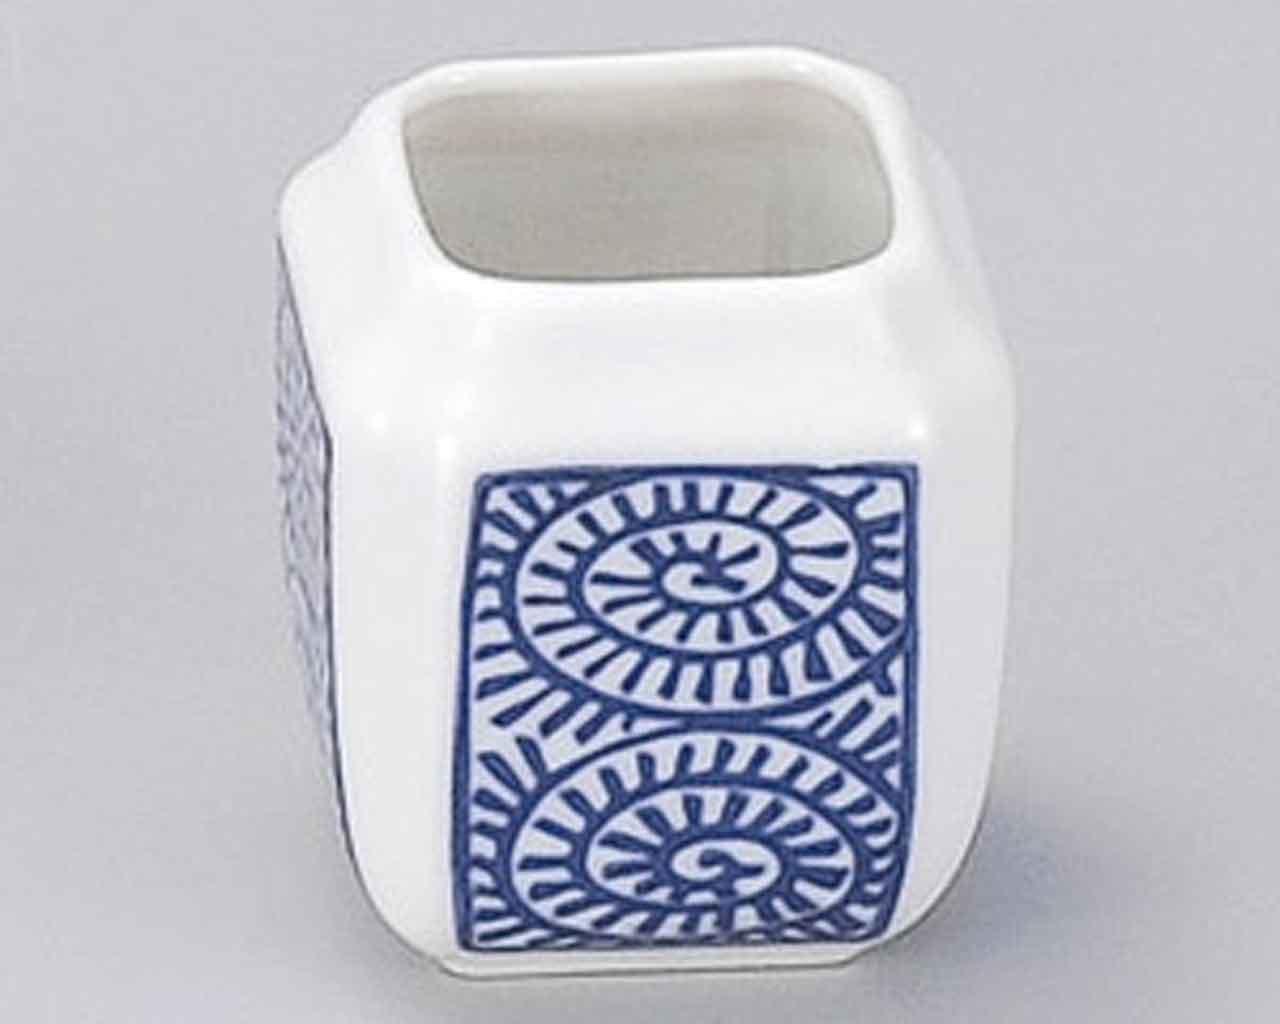 Tako Karakusa 1.9inch Set of 2 Toothpick holders White porcelain Made in Japan